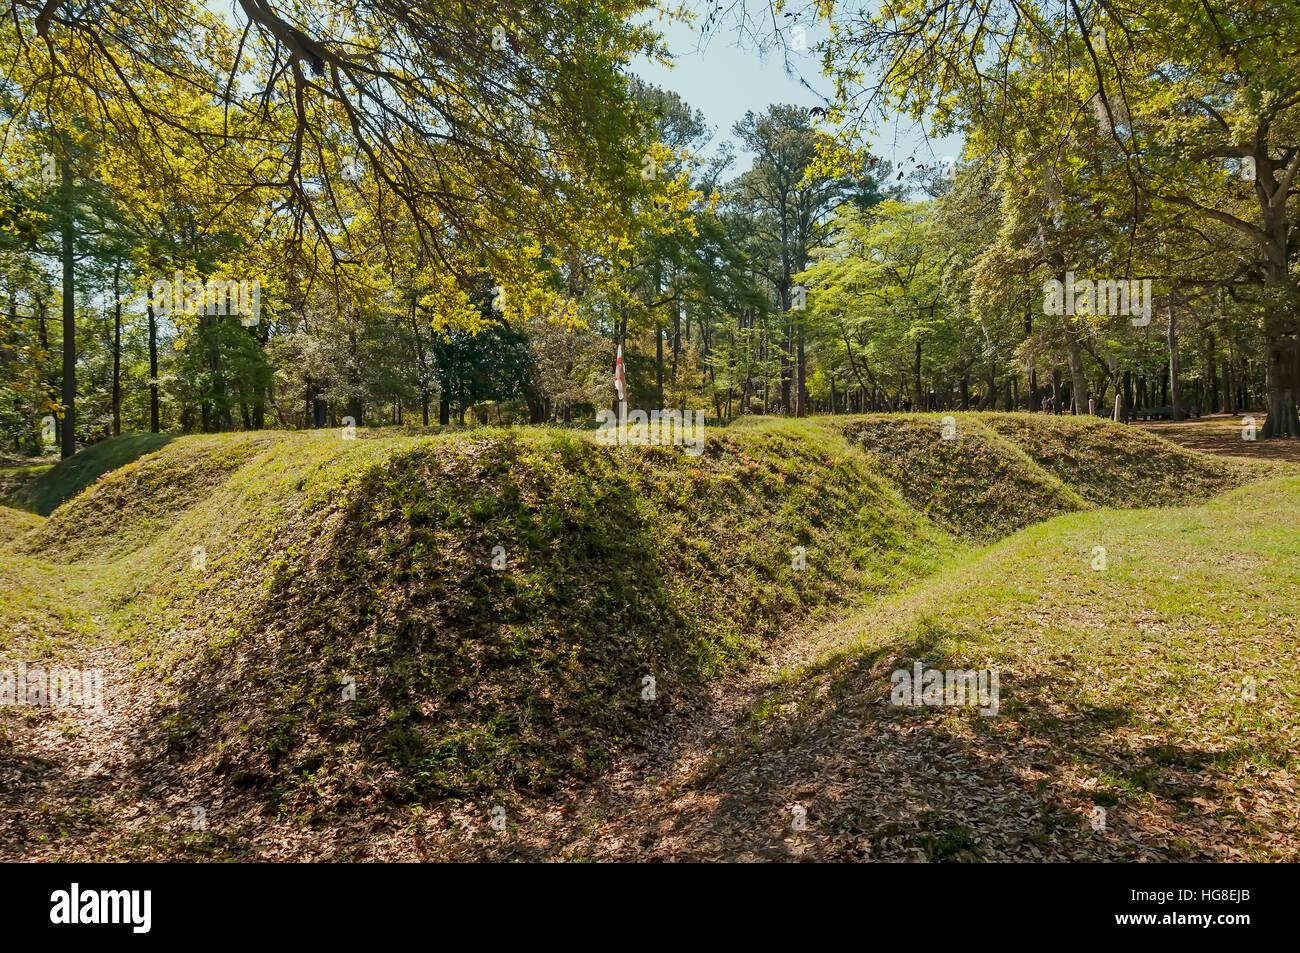 Fort Raleigh National Historic Site, Manteo, Roanoke Island, North Carolina - Stock Image